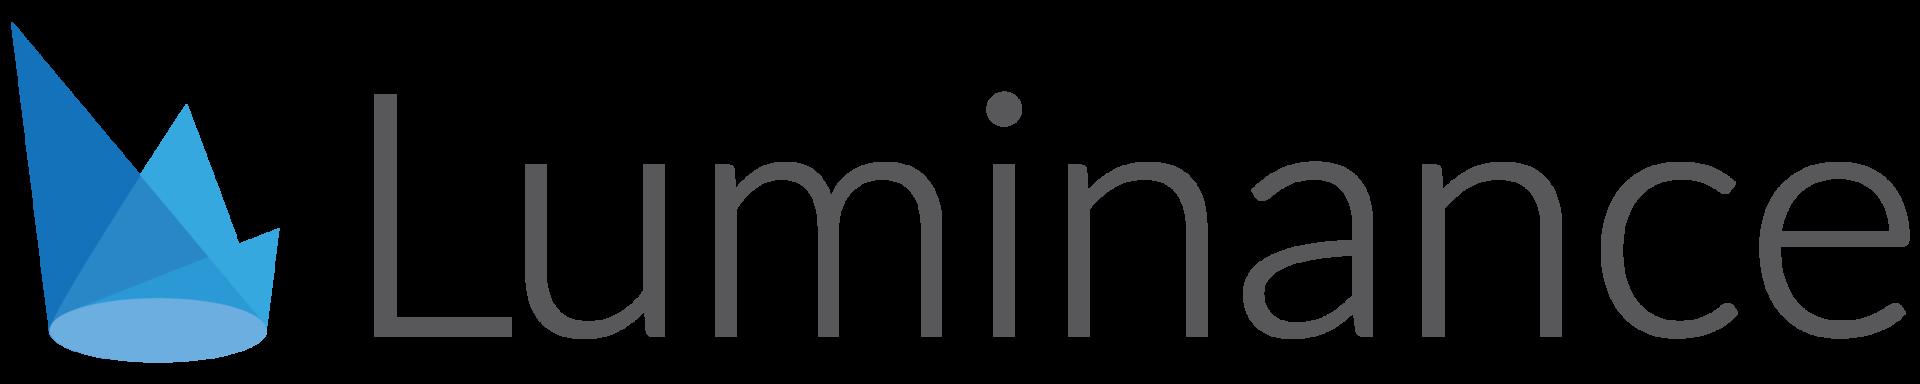 https://secureservercdn.net/166.62.114.250/88j.10c.myftpupload.com/wp-content/uploads/2021/02/Luminance.png